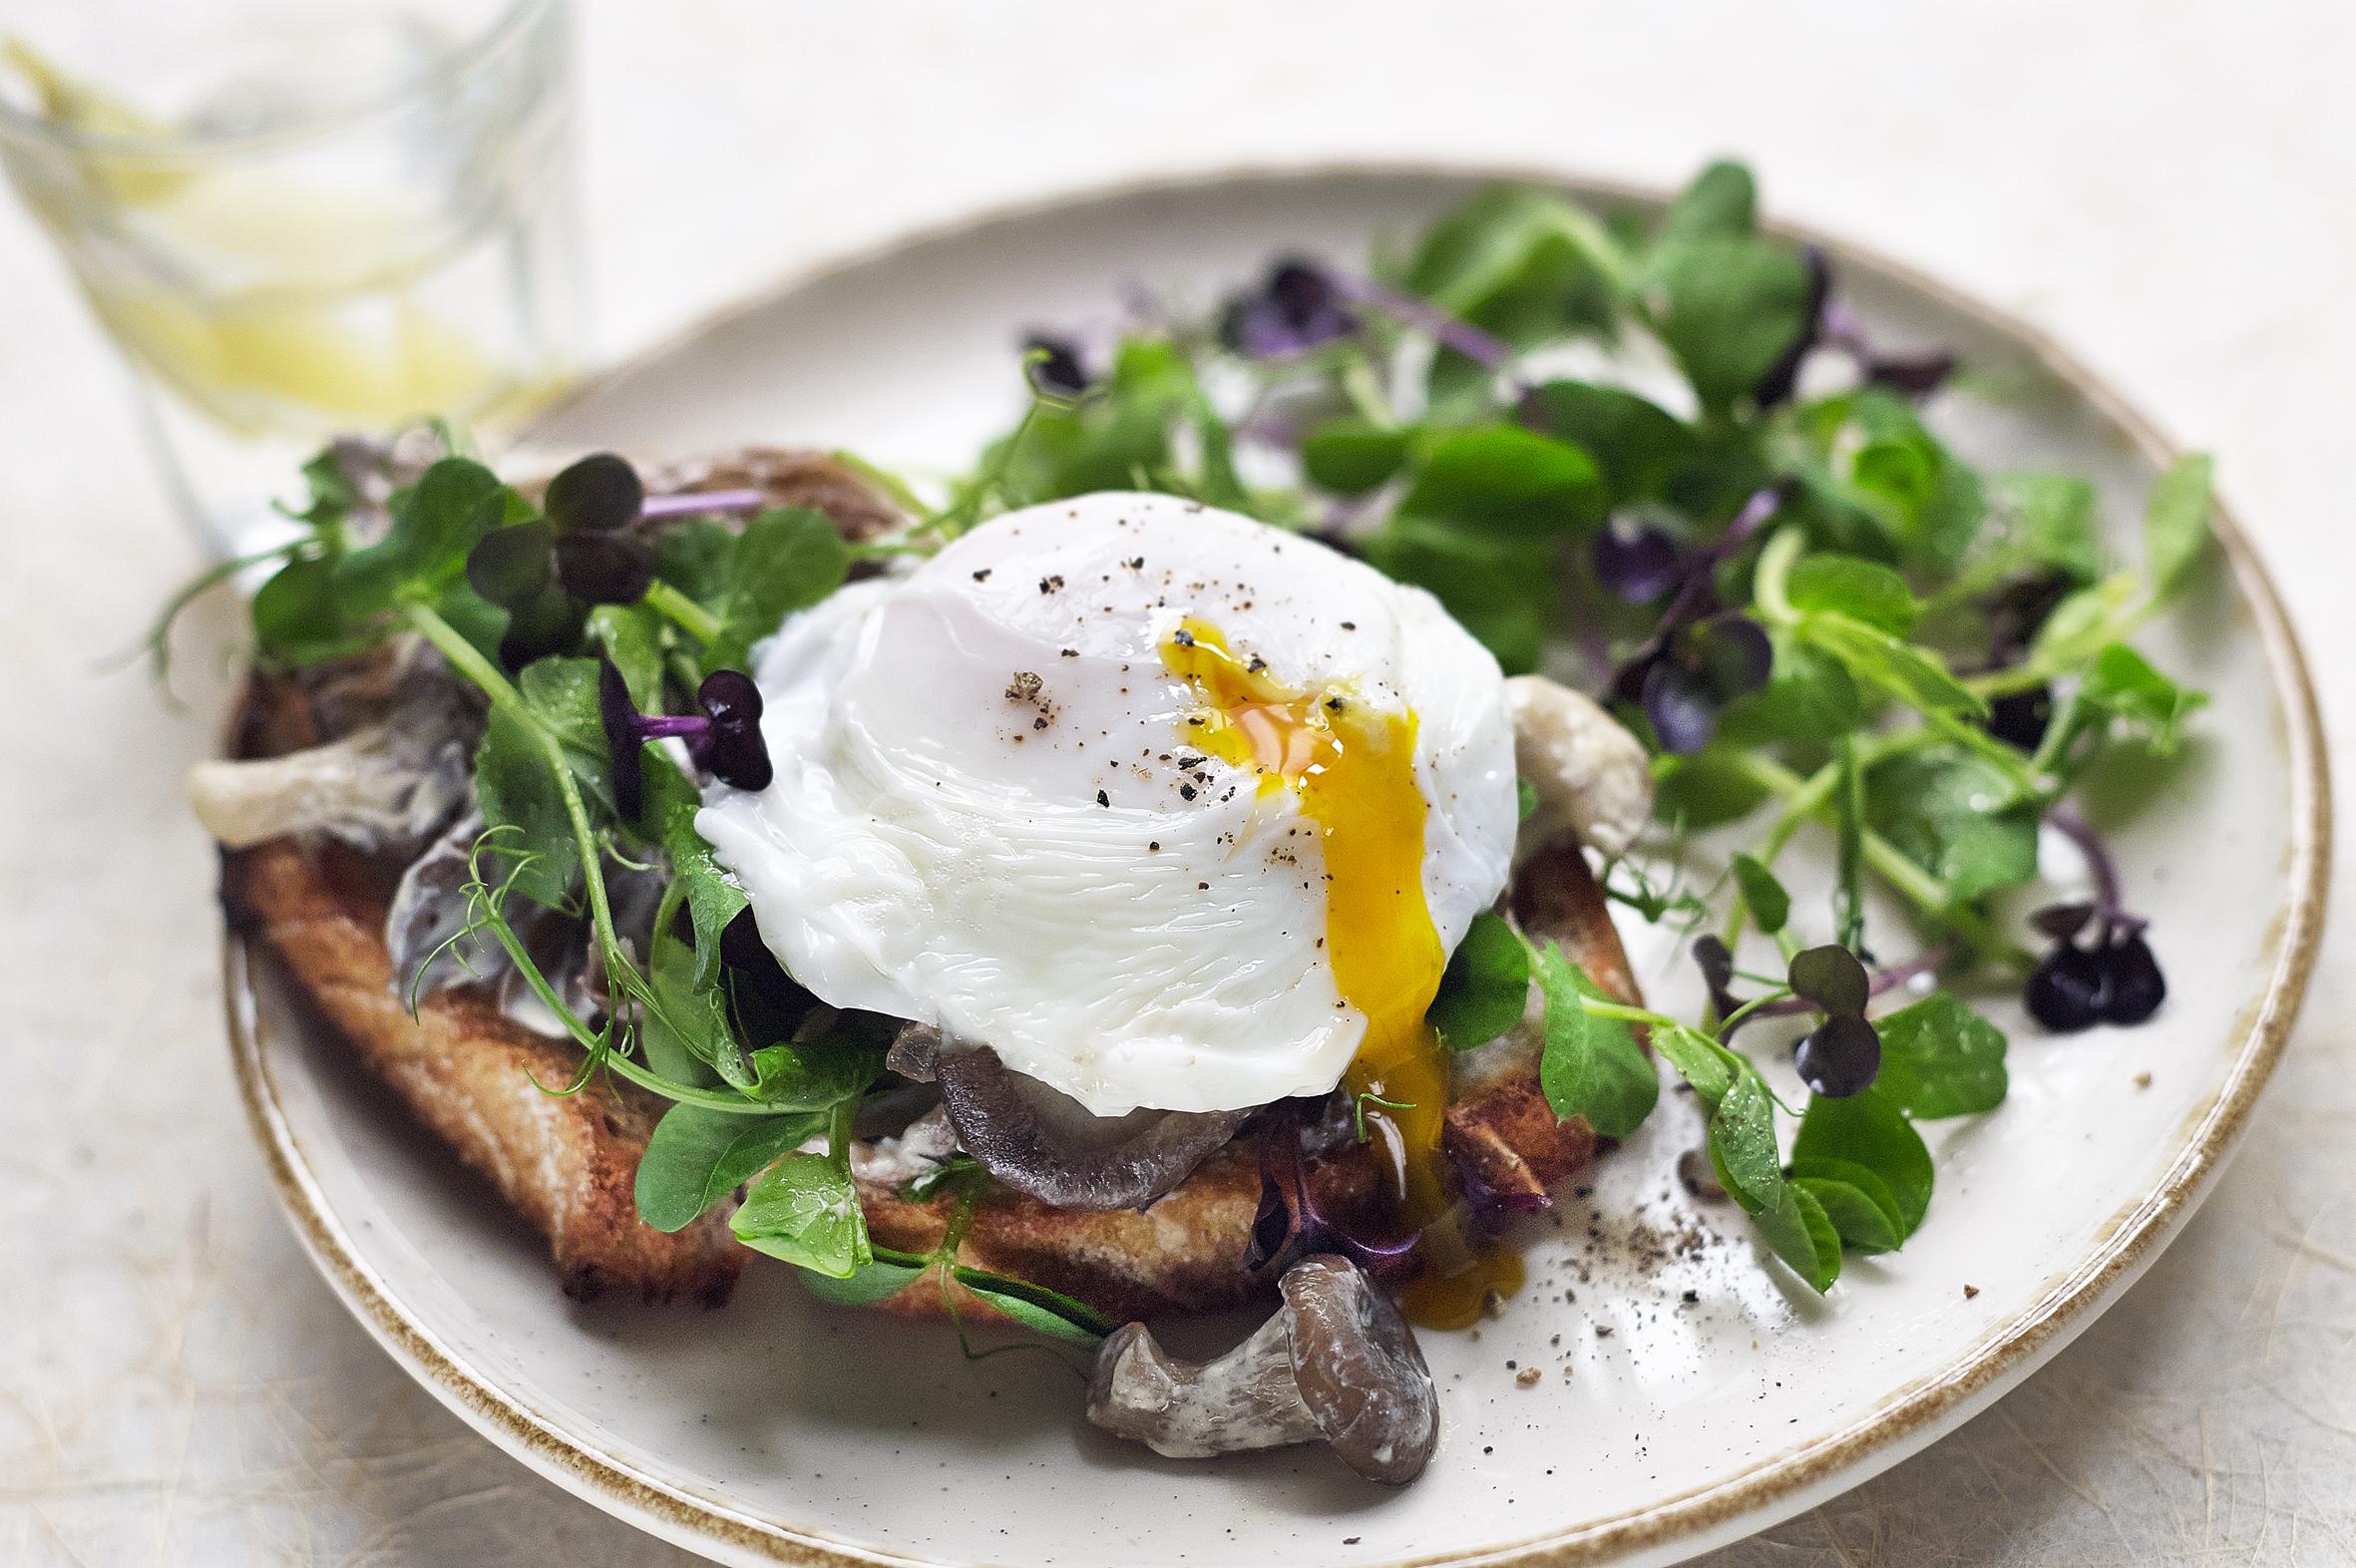 Creamy Mushrooms, Pea Shoots & Poached Egg Toast